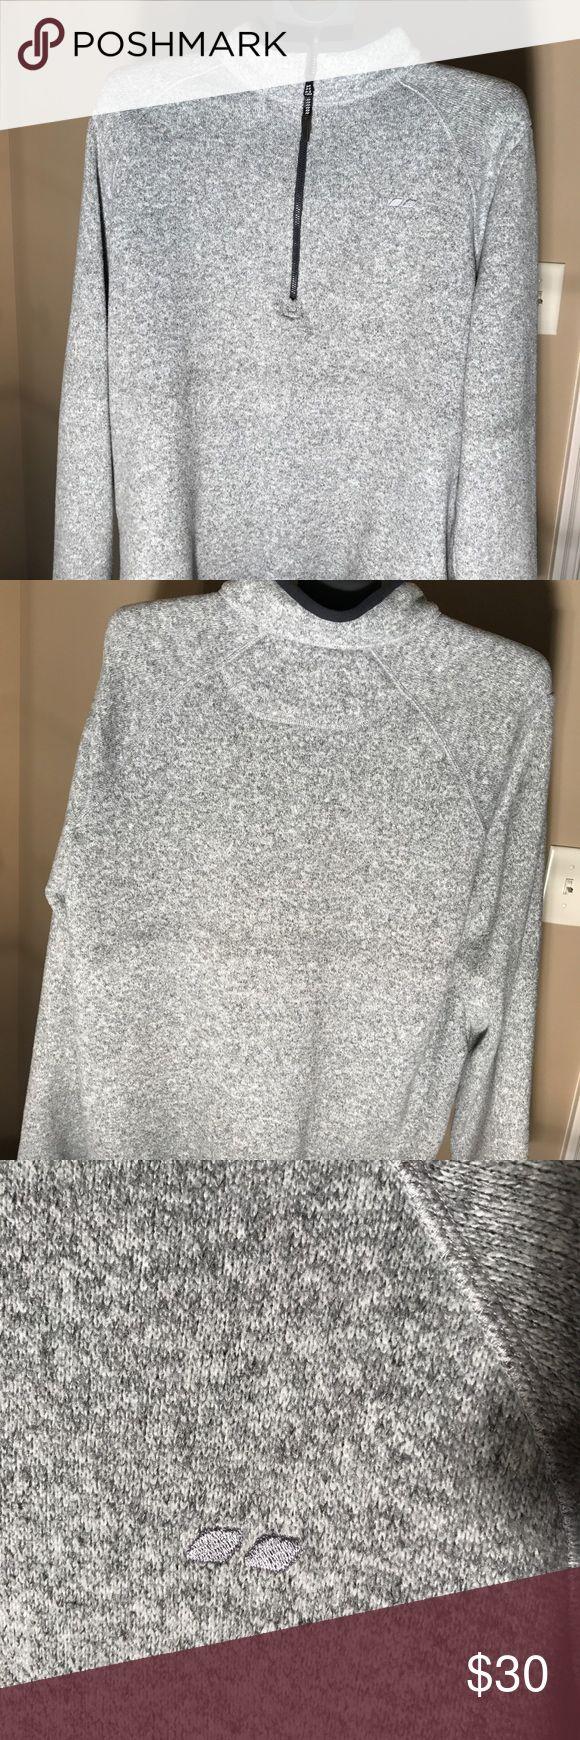 Kipper size large pullover Size Large Koppen pullover. Gray. 100% polyester. Make offer! koppen Jackets & Coats Performance Jackets